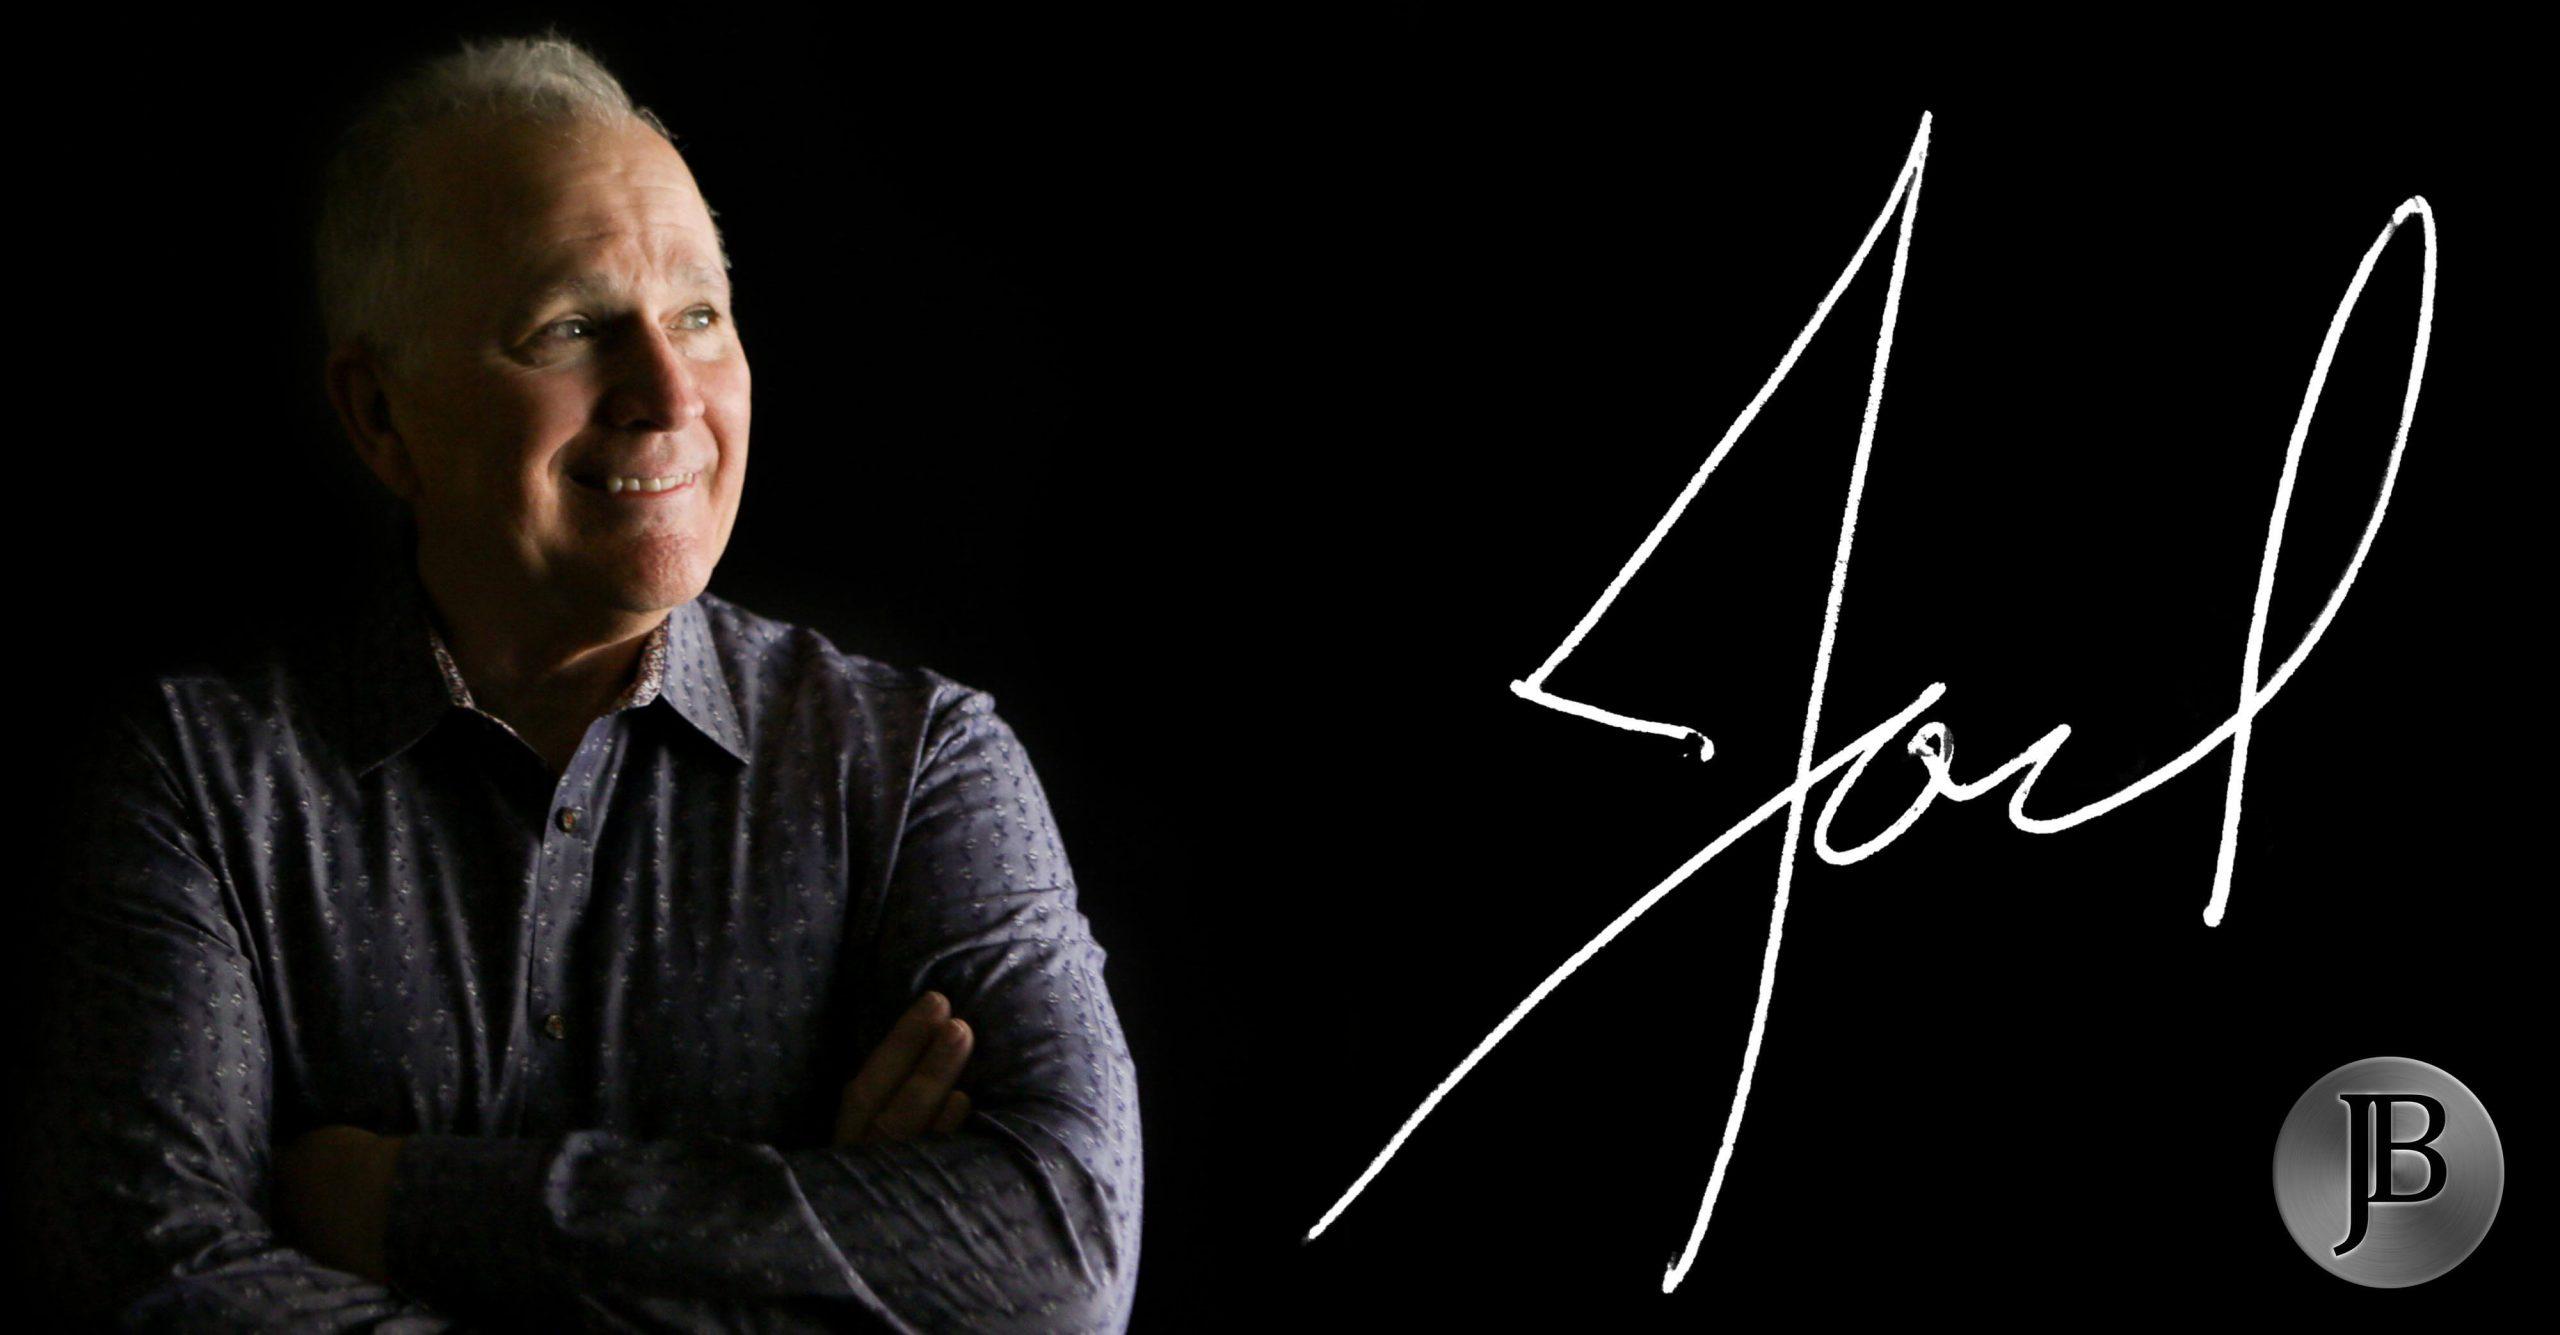 Jack-Signature-logo